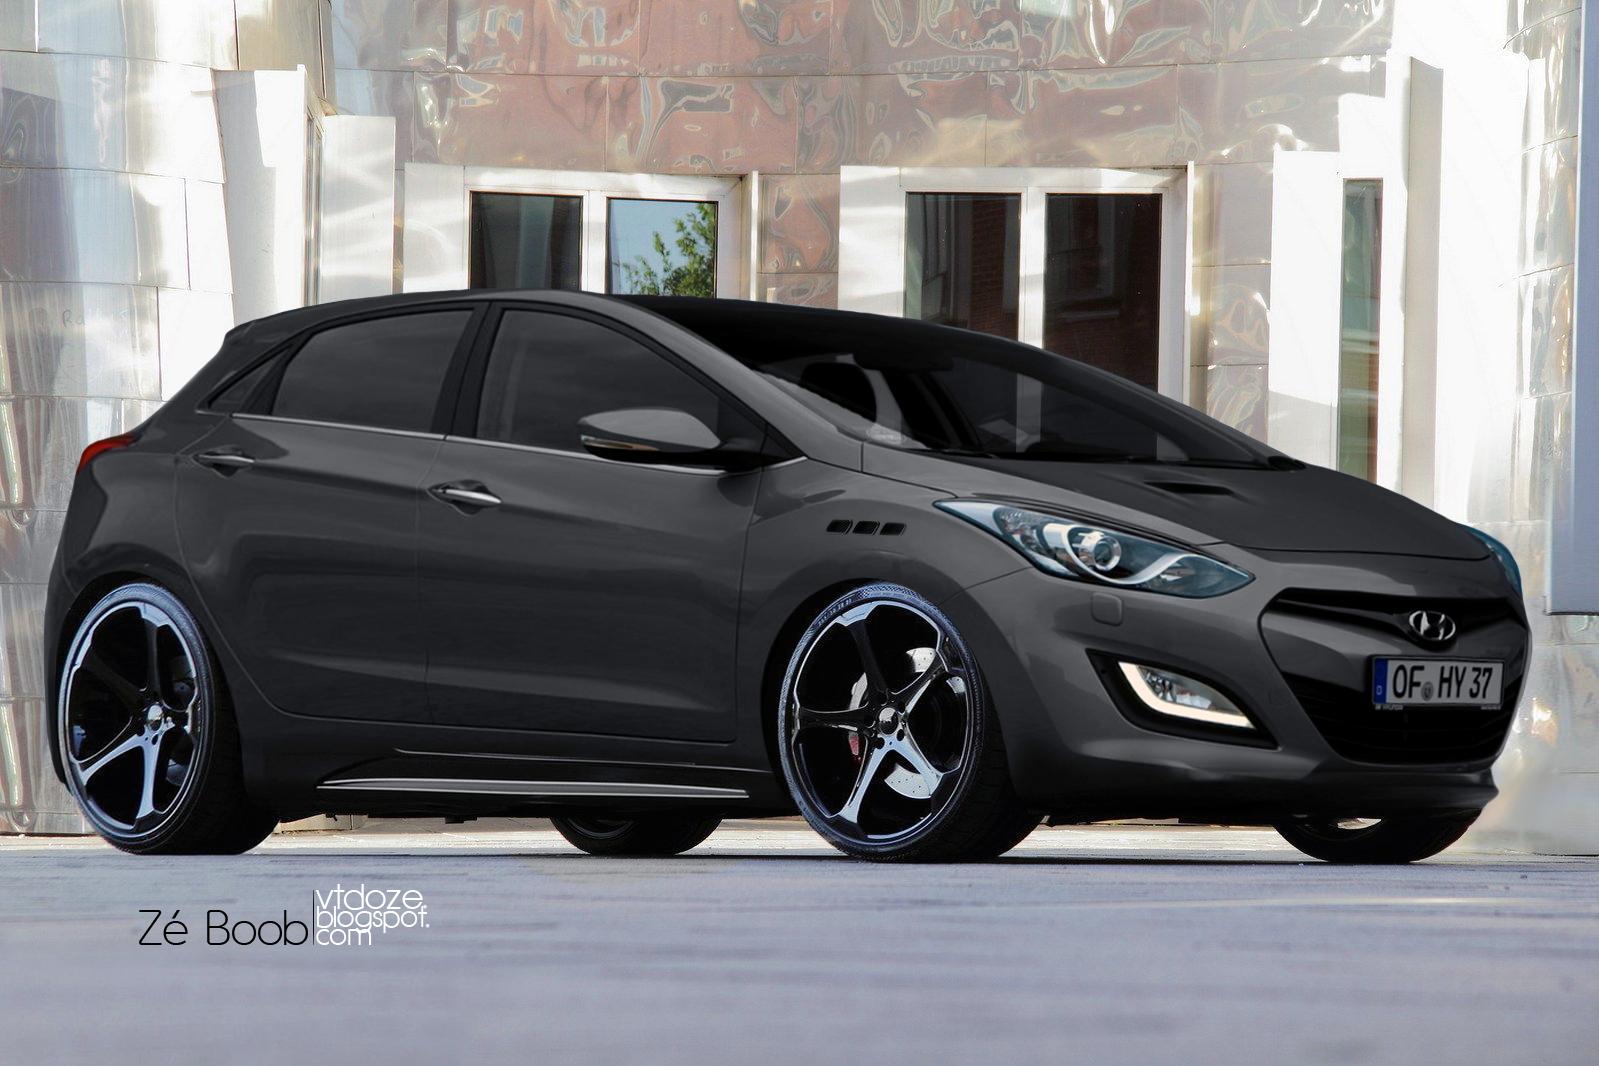 Ford Fusion St >> Virtual Tuning do Zé: i30